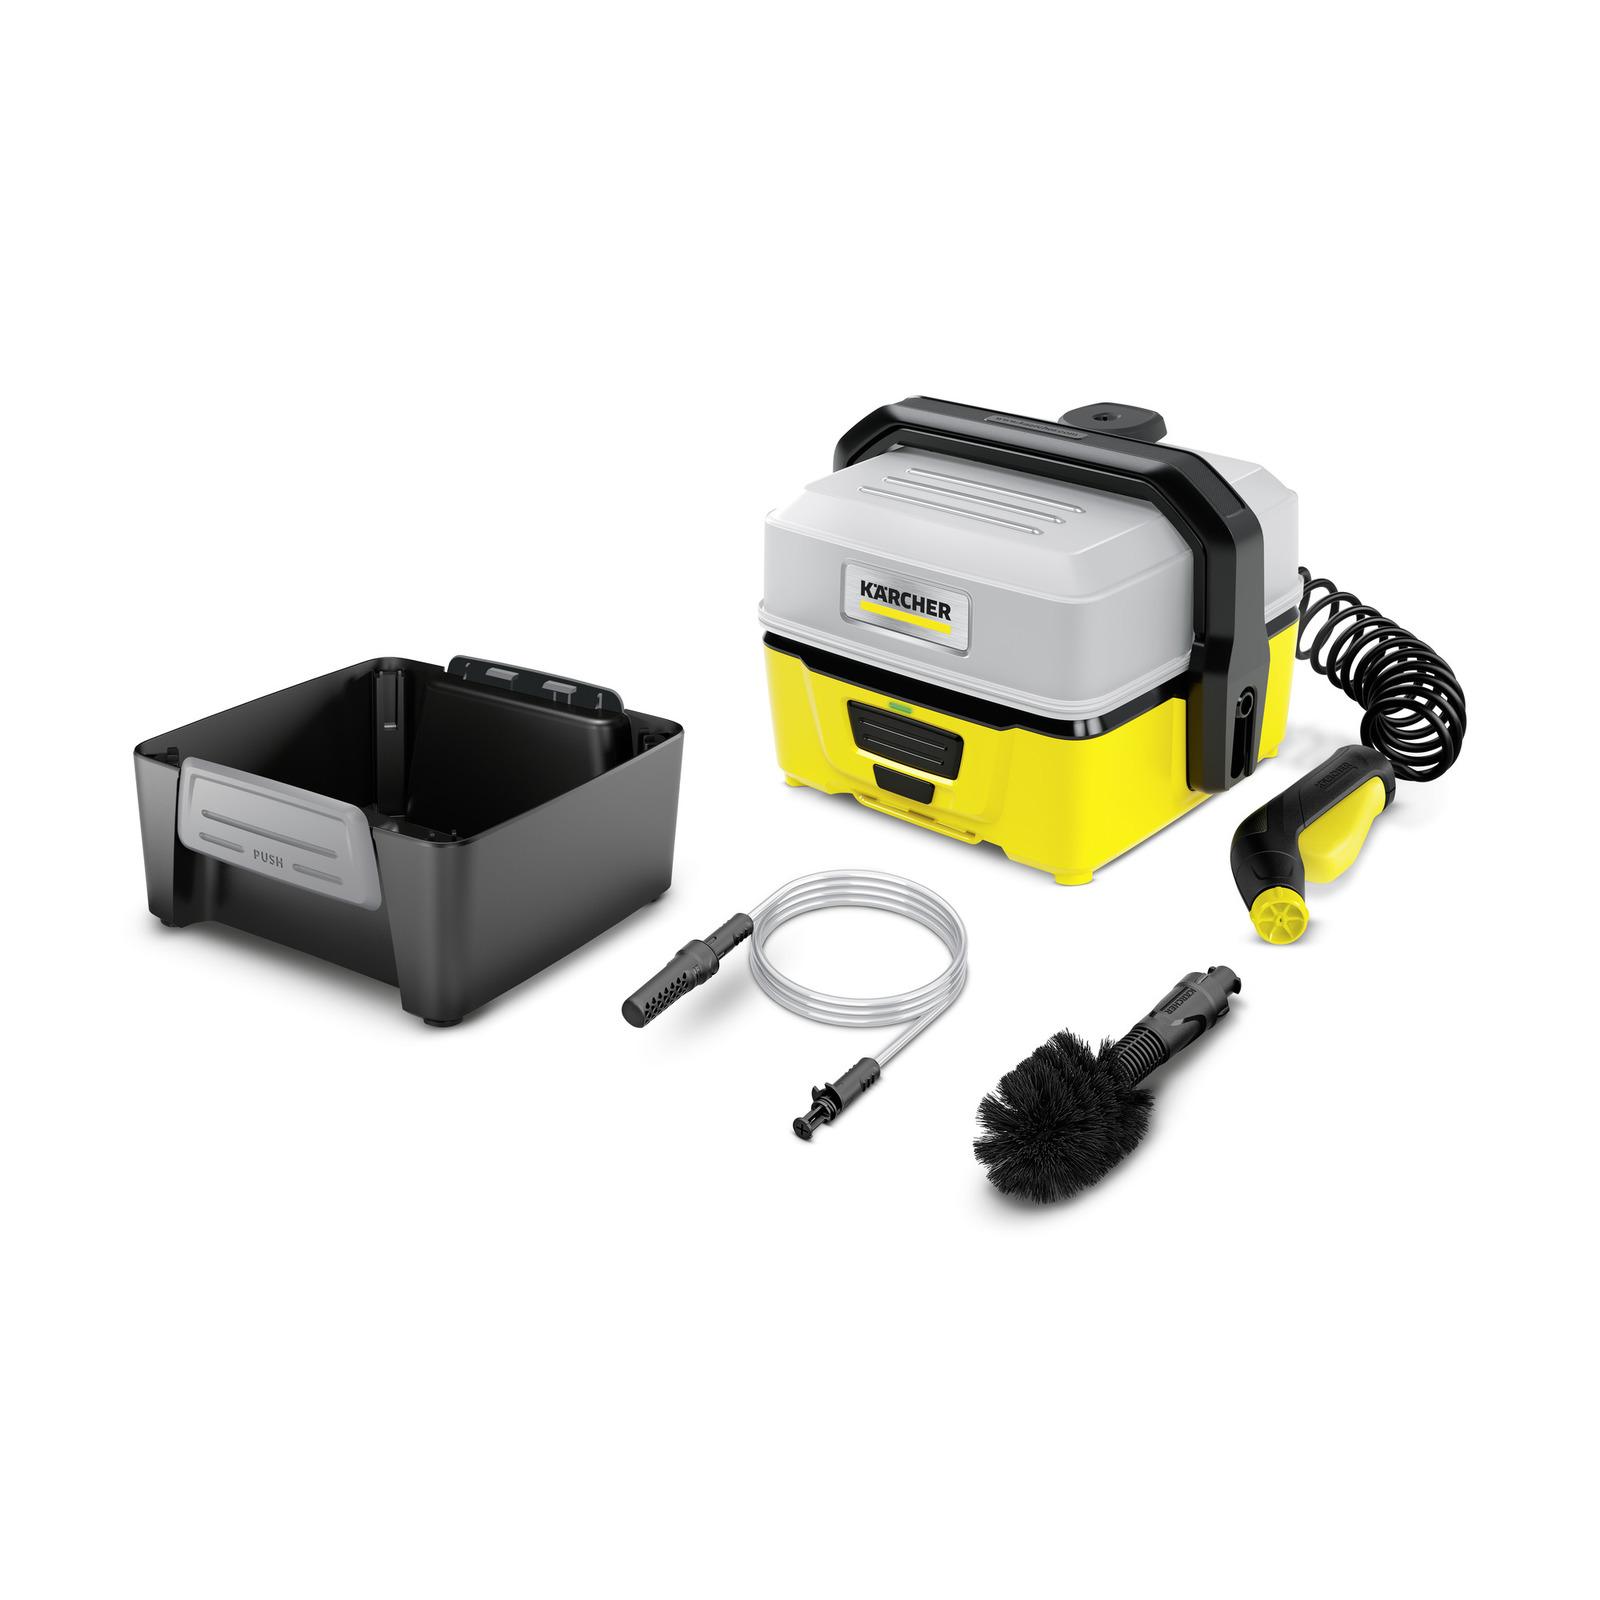 KARCHER 1.680-016.0 - OC3 Plus Adventure Mobile Outdoor Cleaner